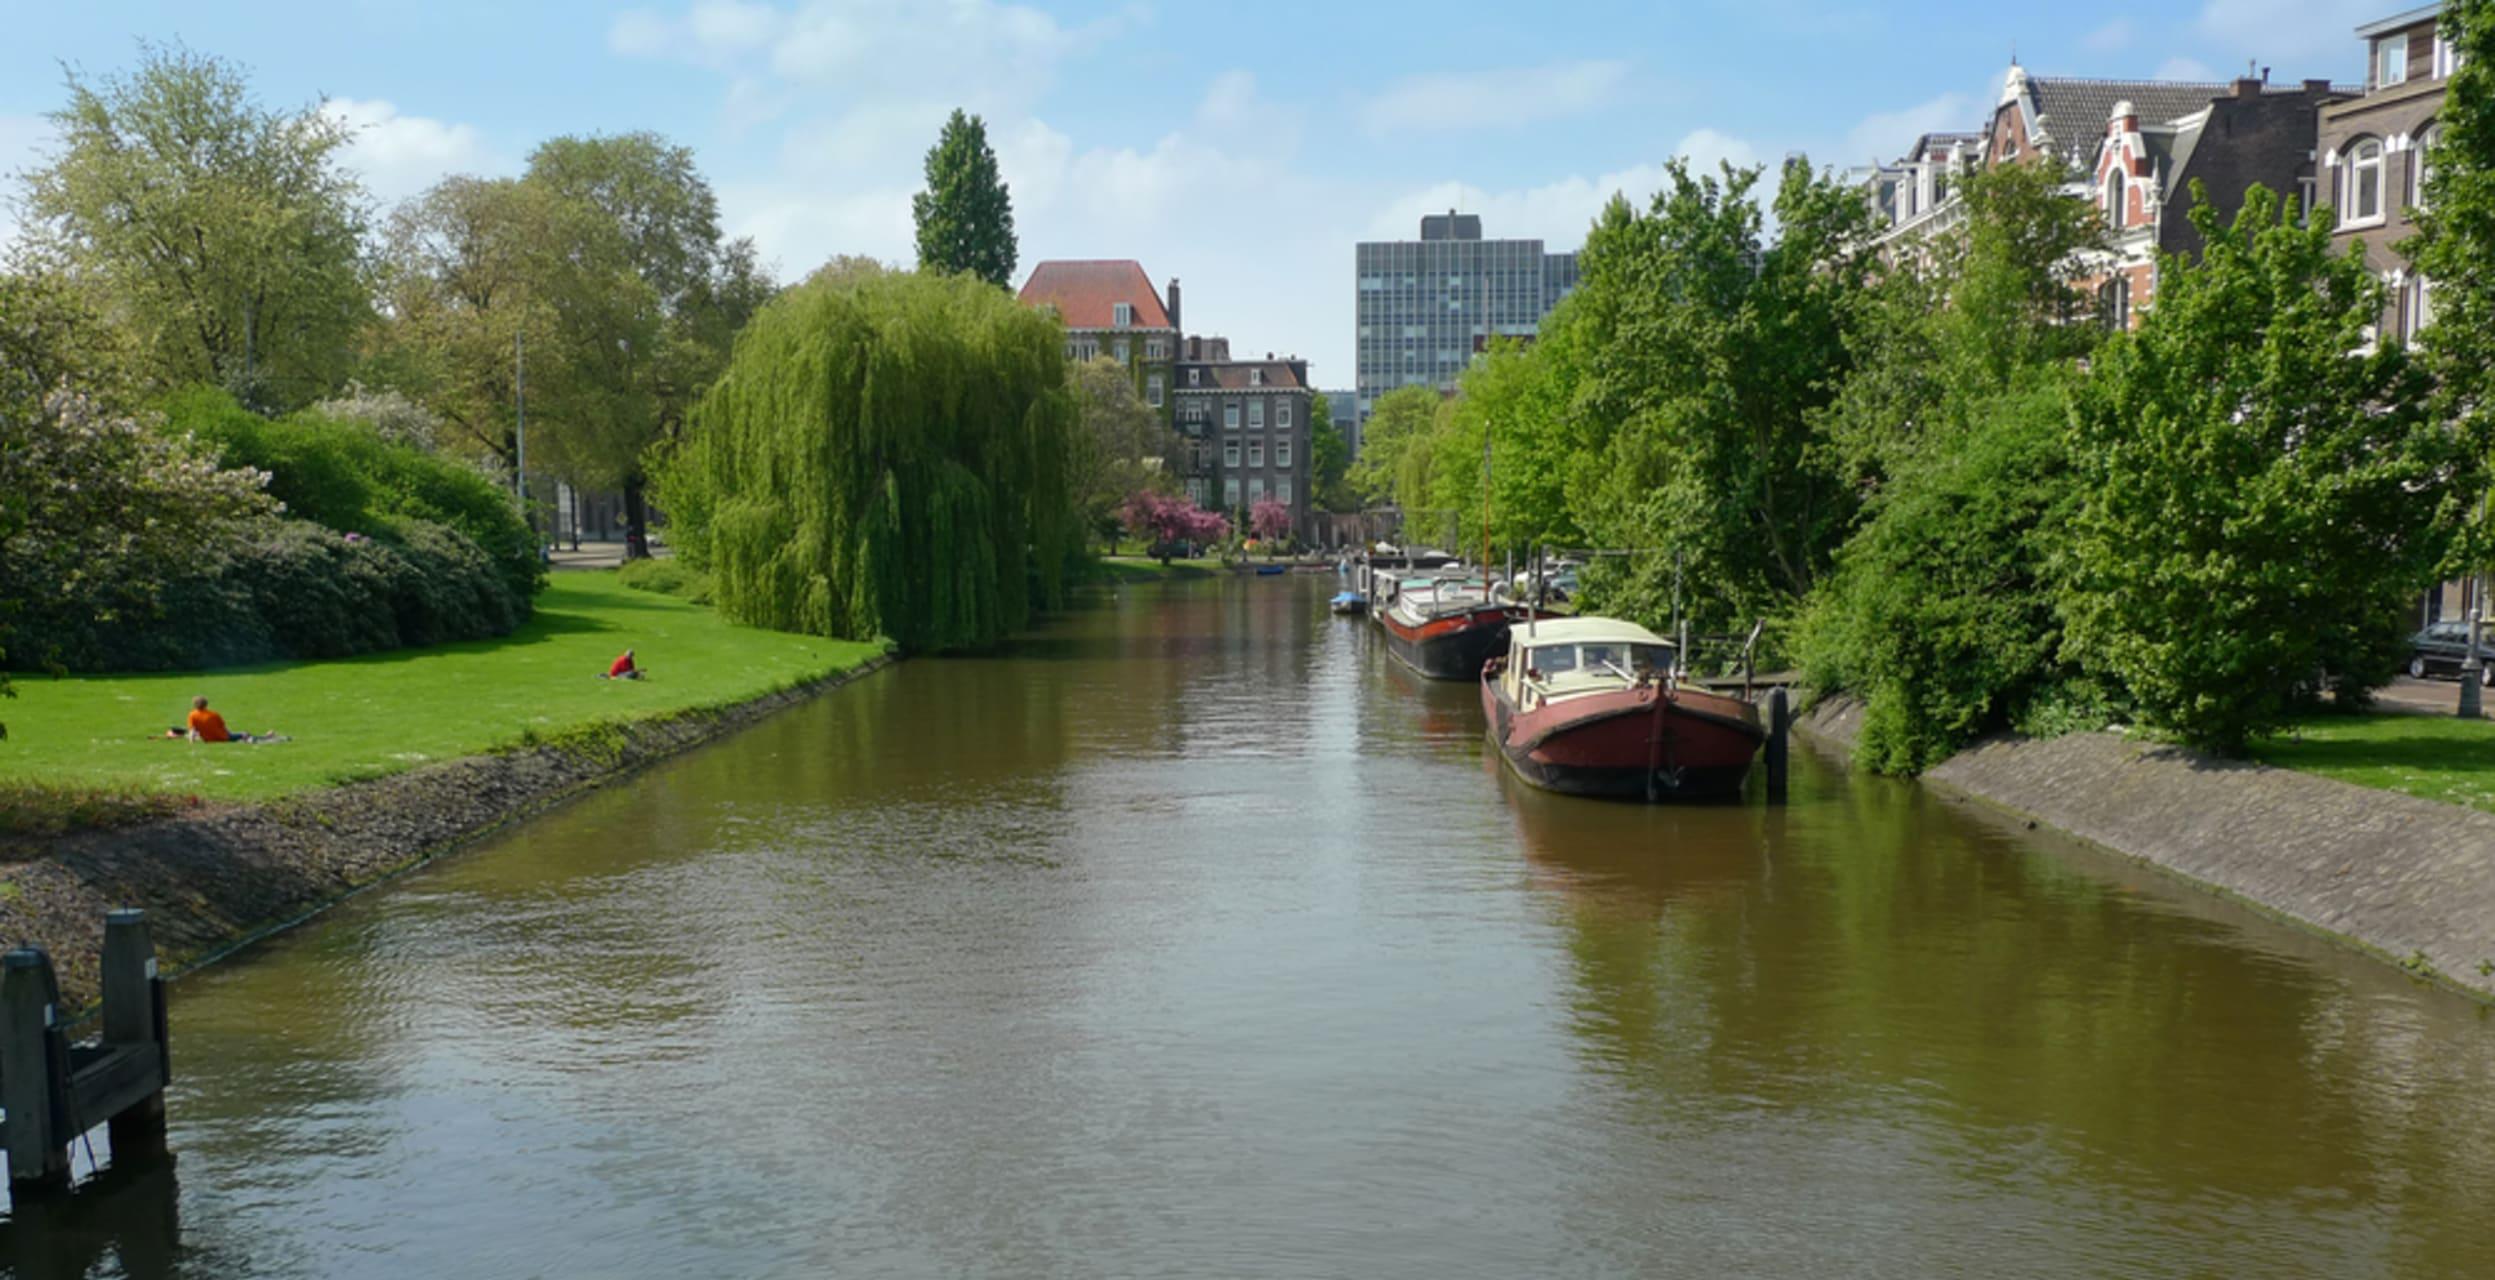 Amsterdam - Heroic Stories of Dutch Resistance in World War II